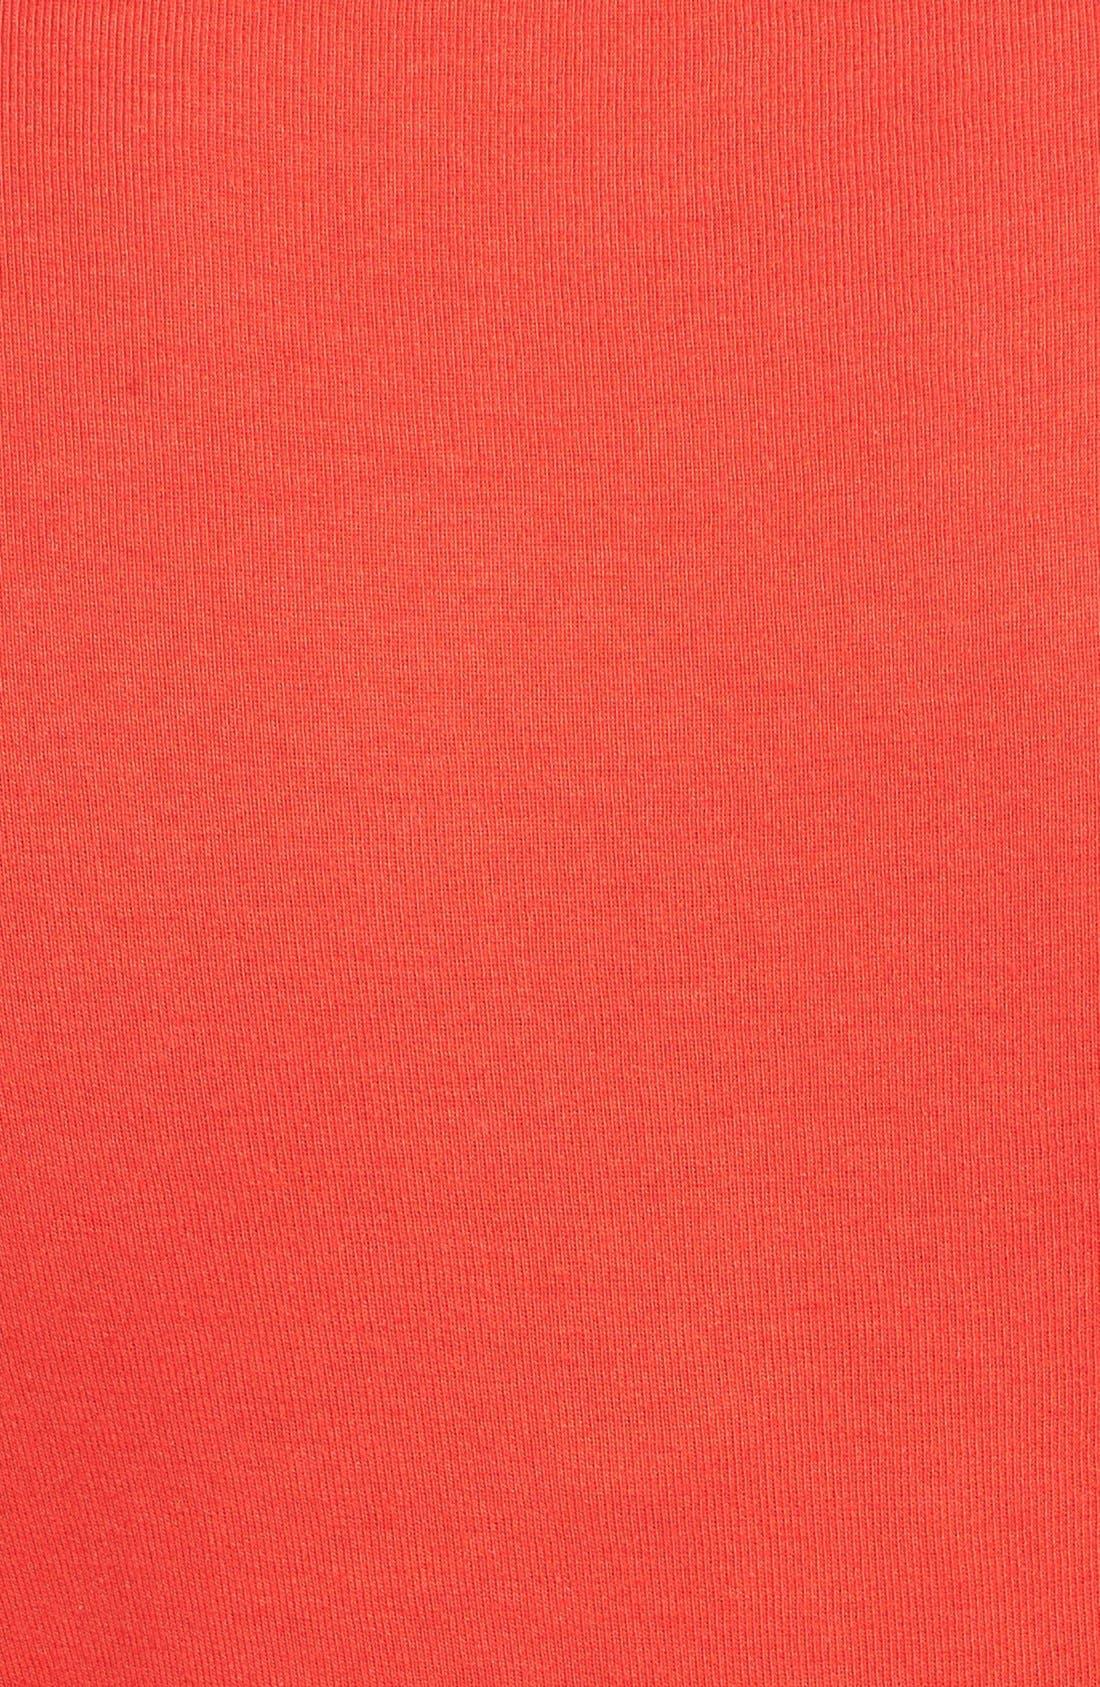 Ballet Neck Cotton & Modal Knit Elbow Sleeve Tee,                             Alternate thumbnail 208, color,